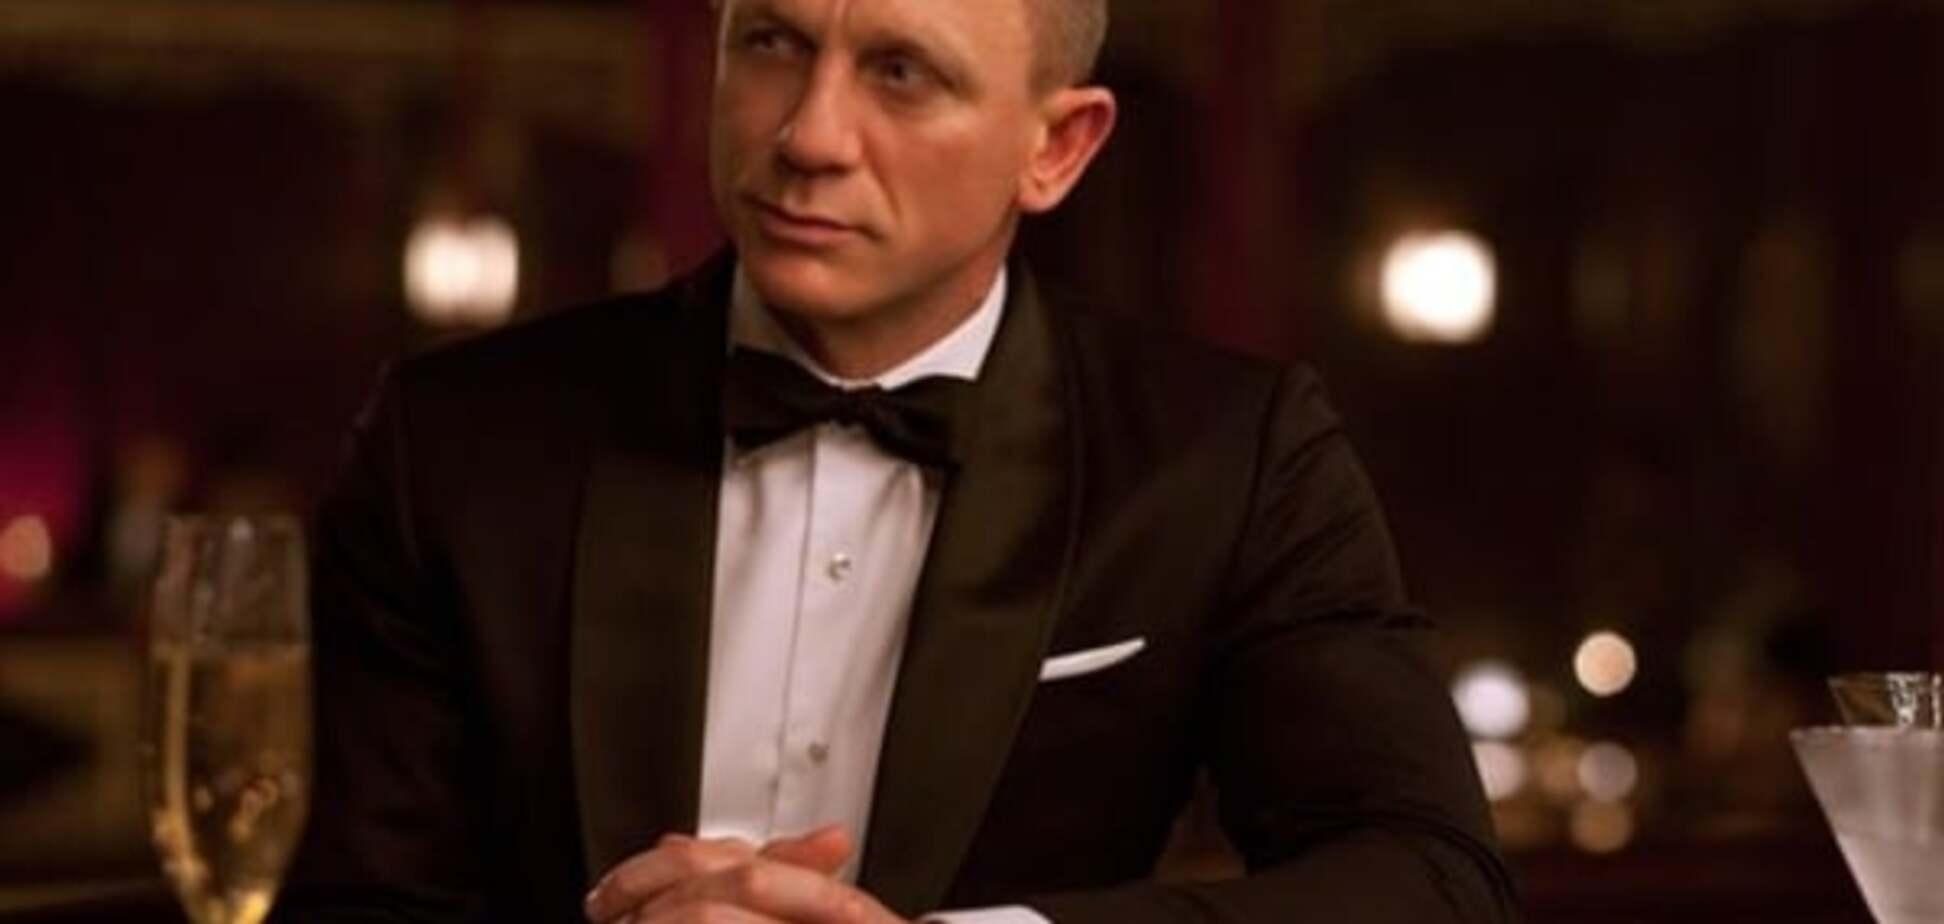 Дэниелу Крейгу предложили за роль агента 007 впечатляющий гонорар